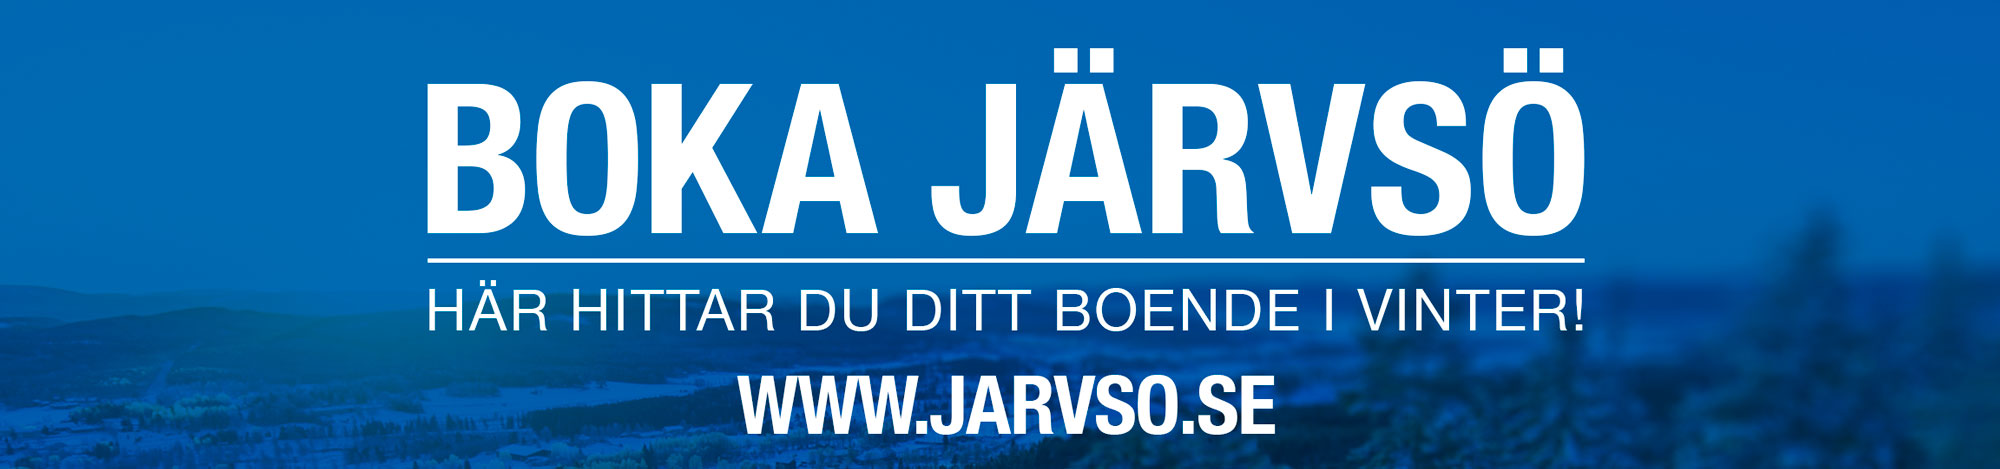 Boka boende i Järvsö